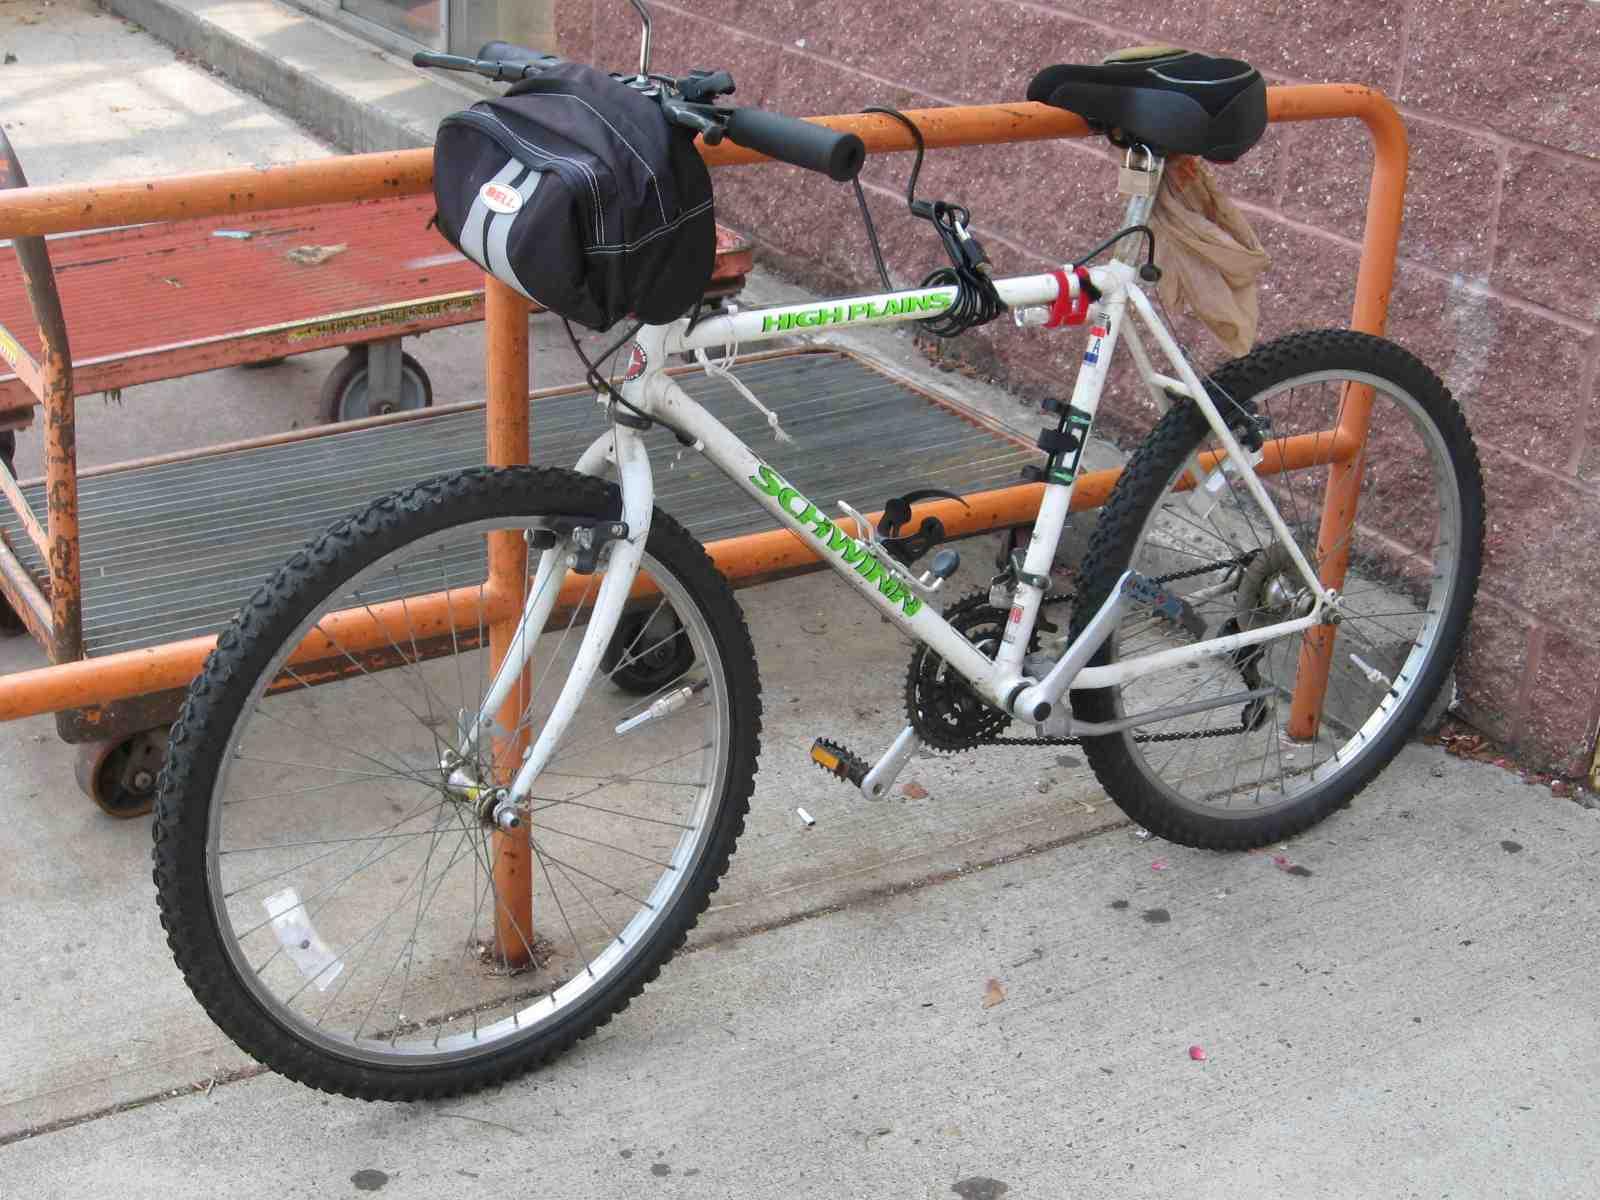 b203f8c3ff7 the beat bike blog: Bikes Outside: High Plains Drifter Makes My Day